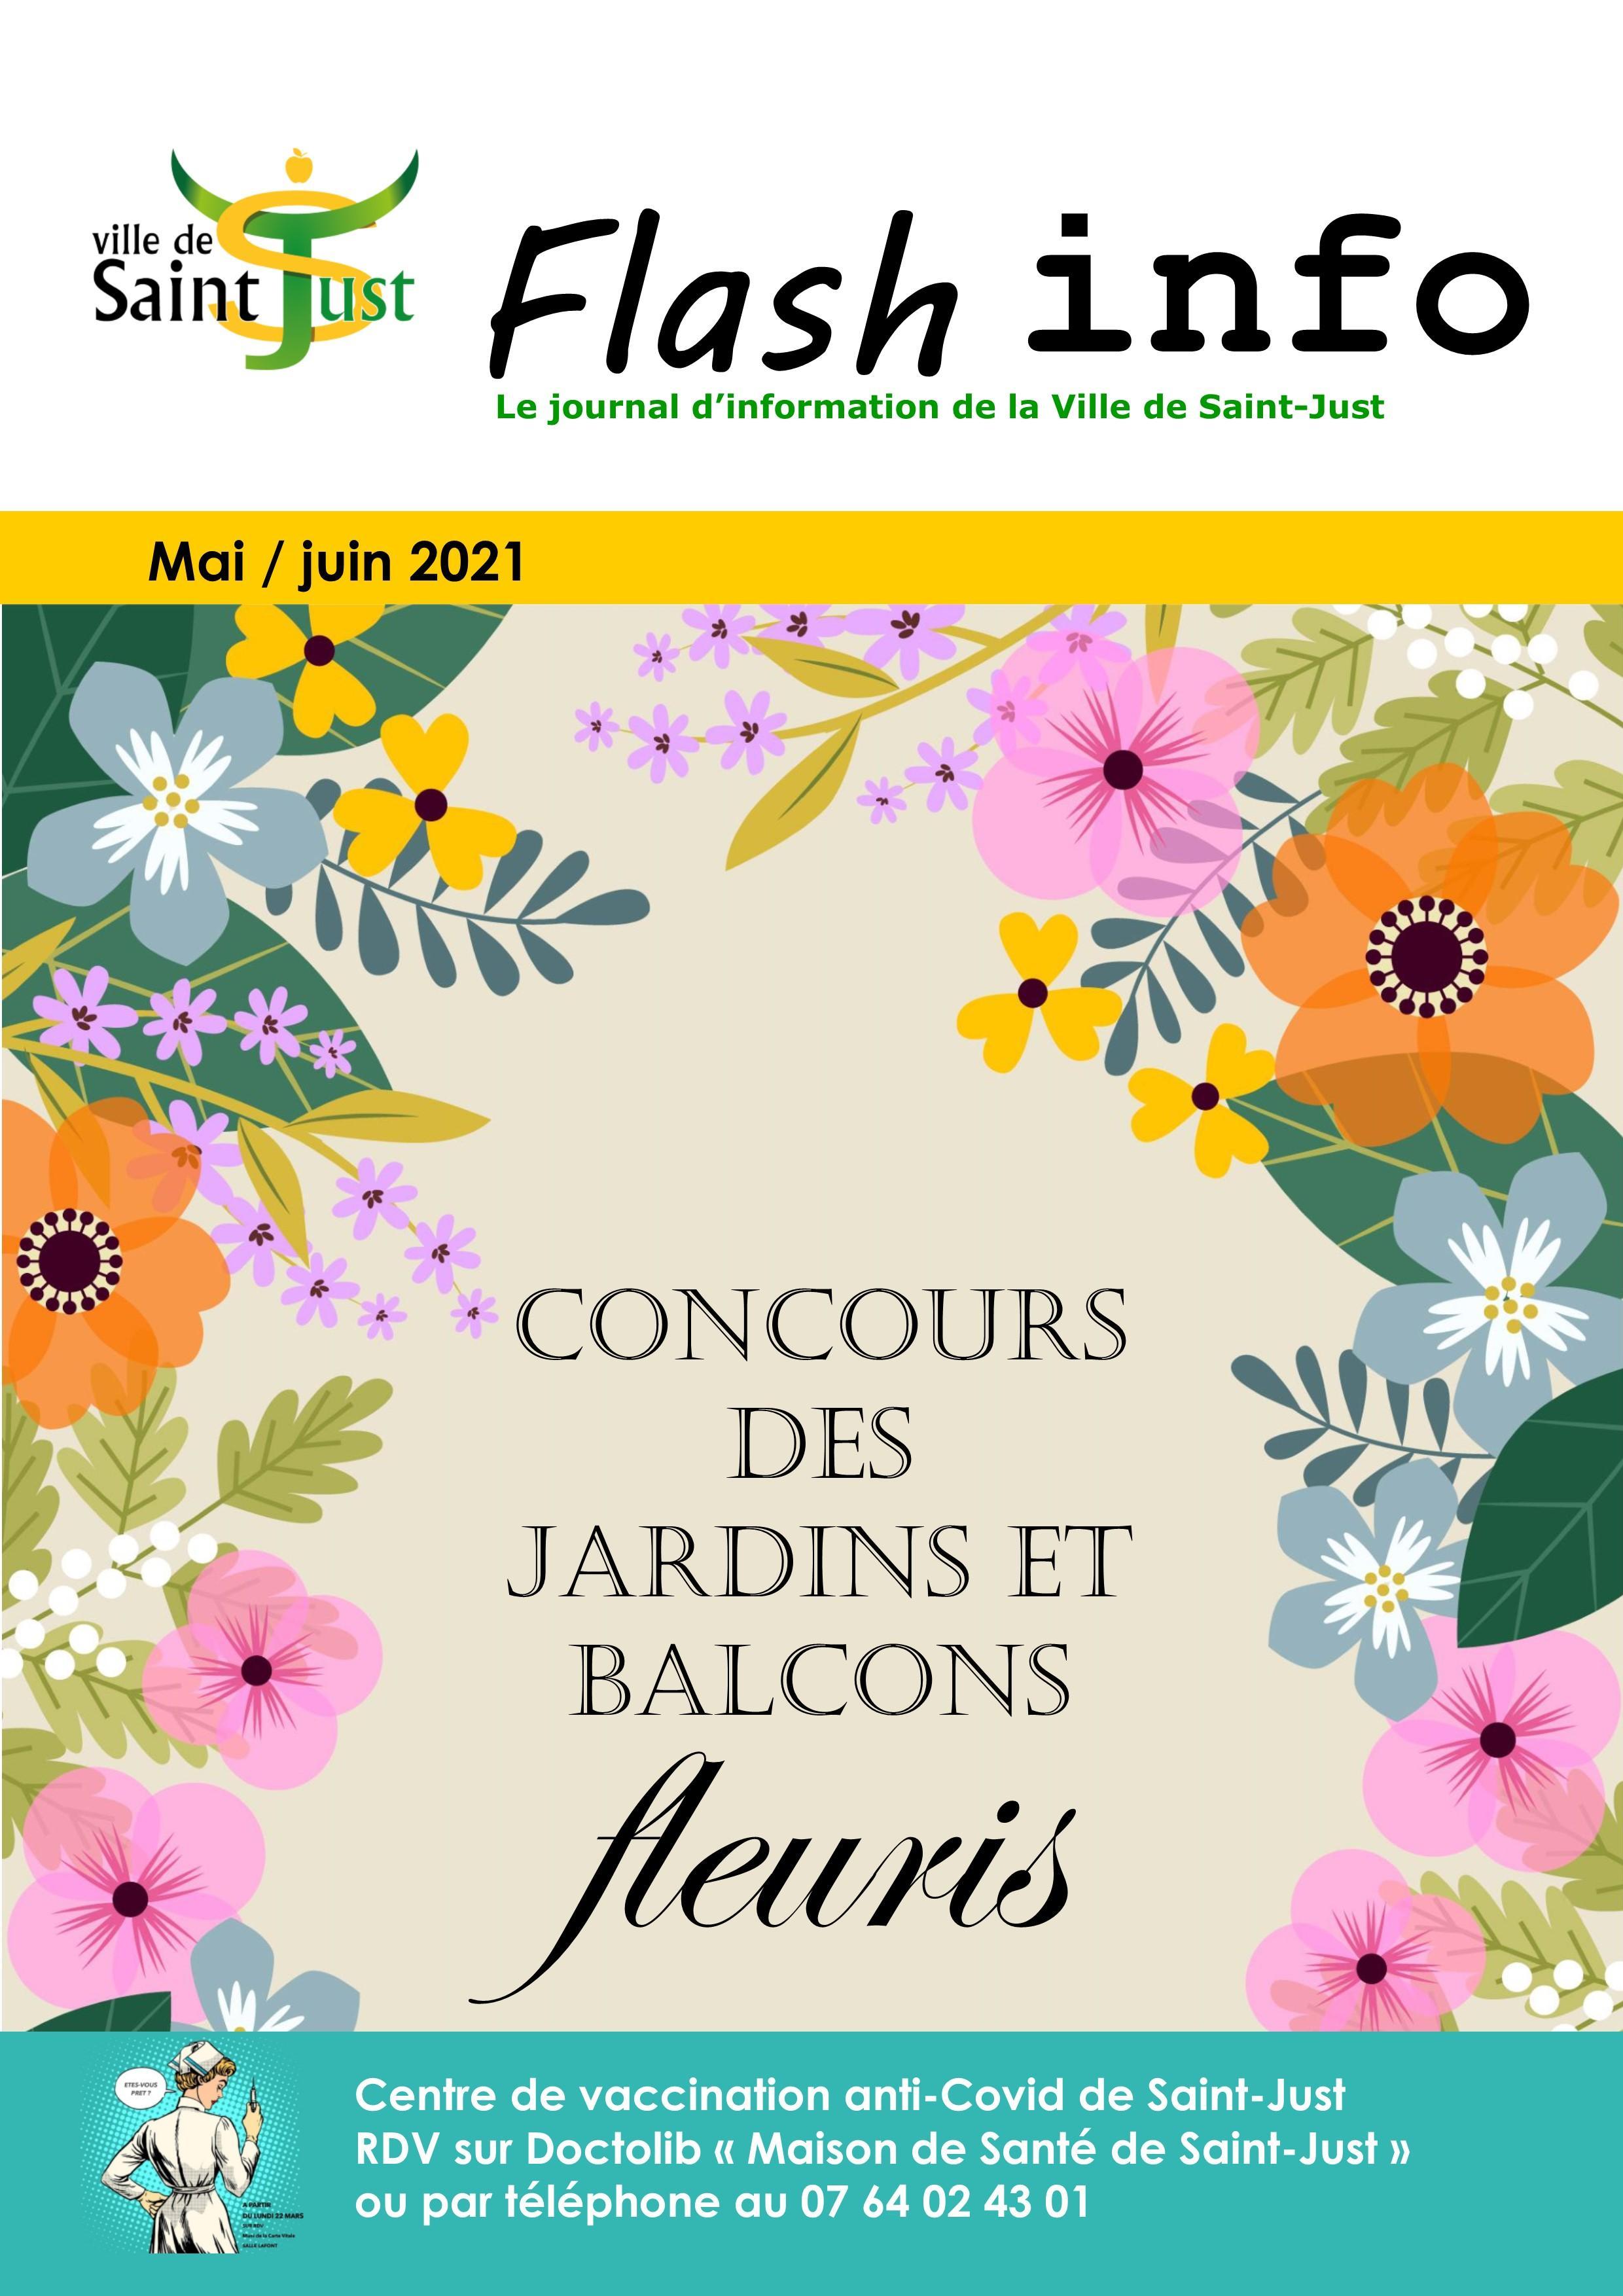 Image de couverture - Flash info mai / juin